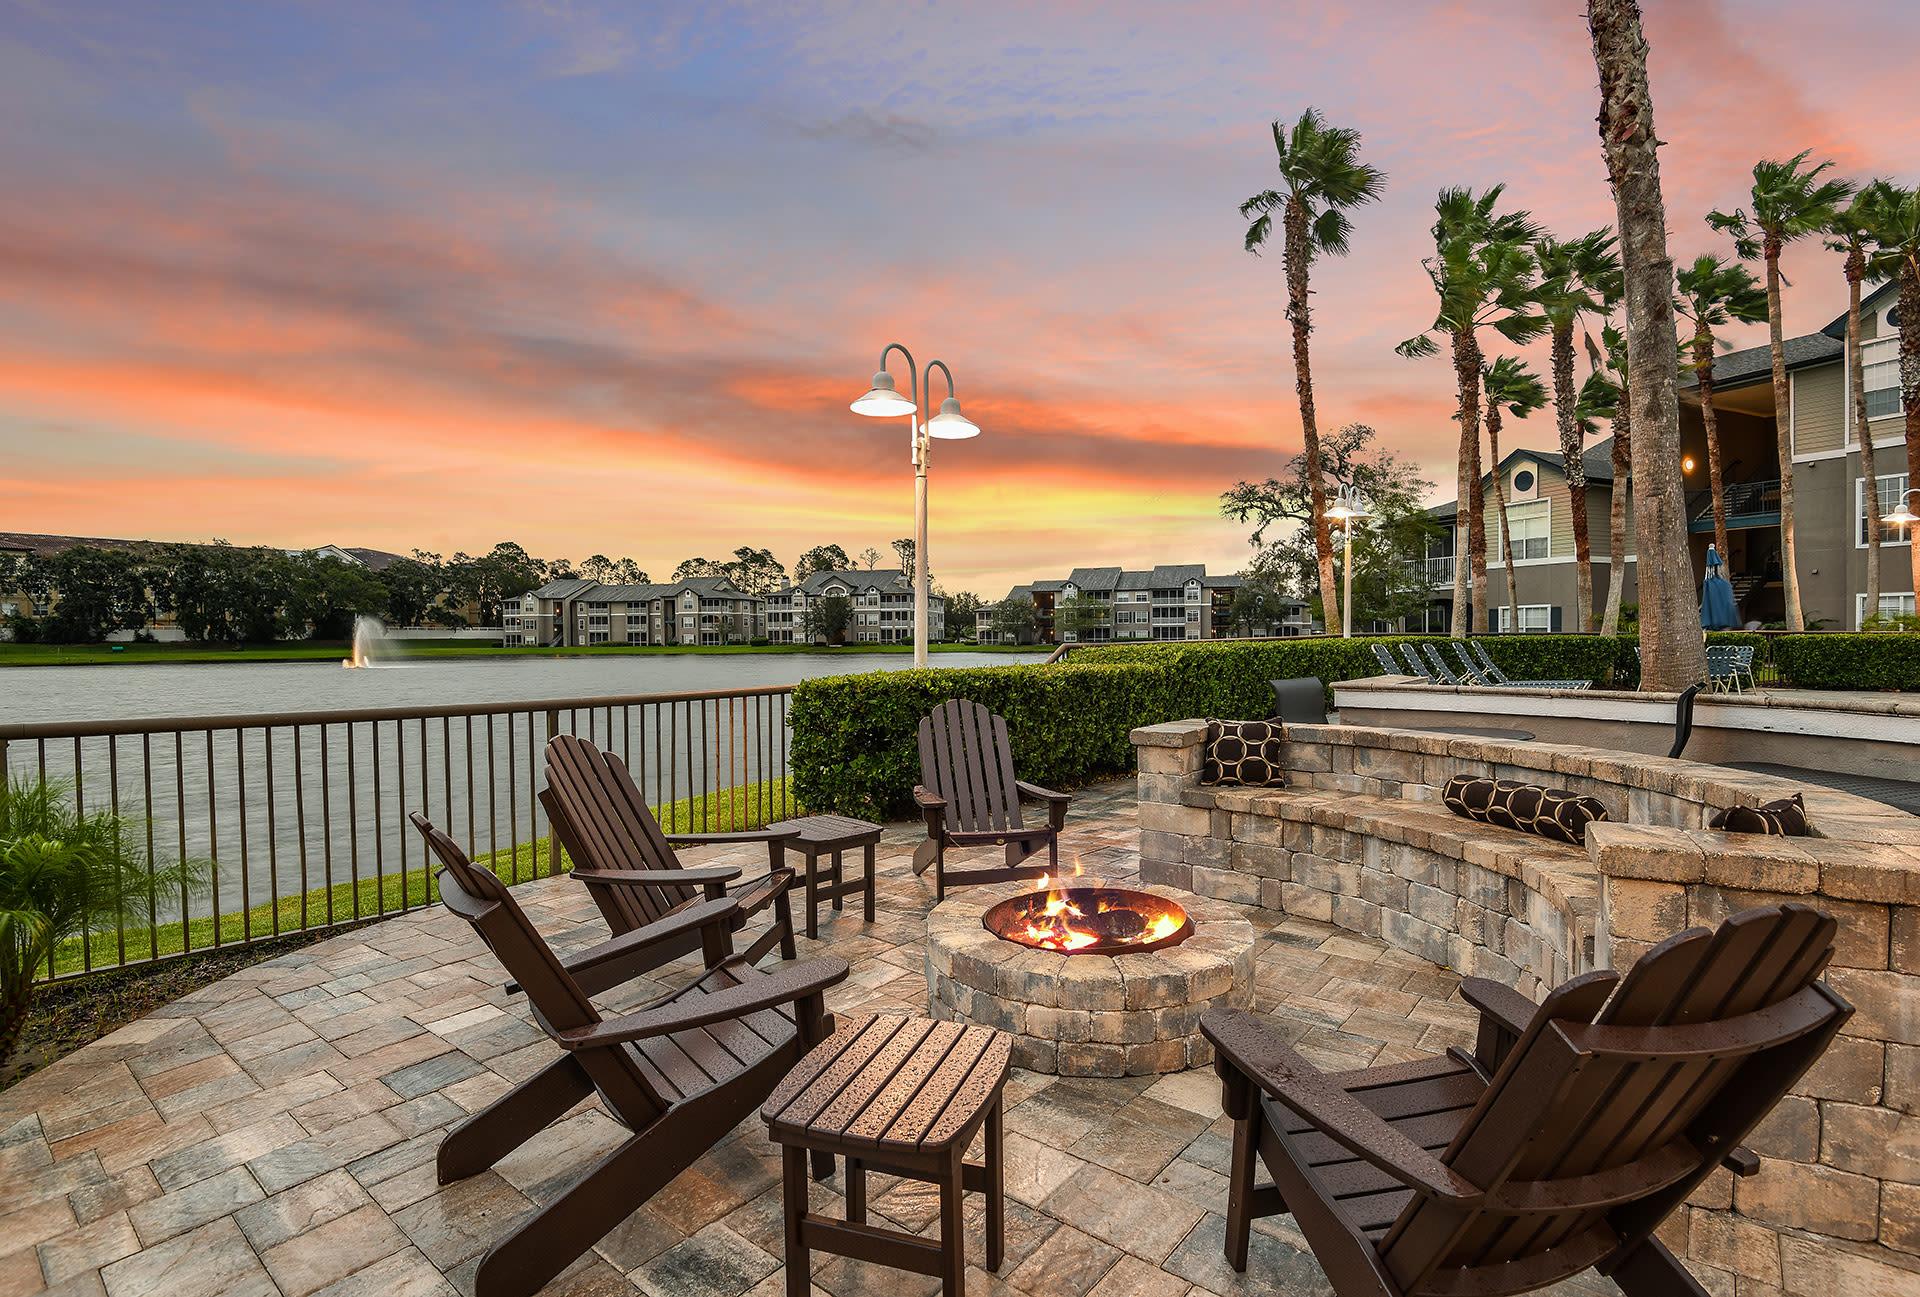 Sunset at Ocean Park of Ponte Vedra in Jacksonville Beach, Florida